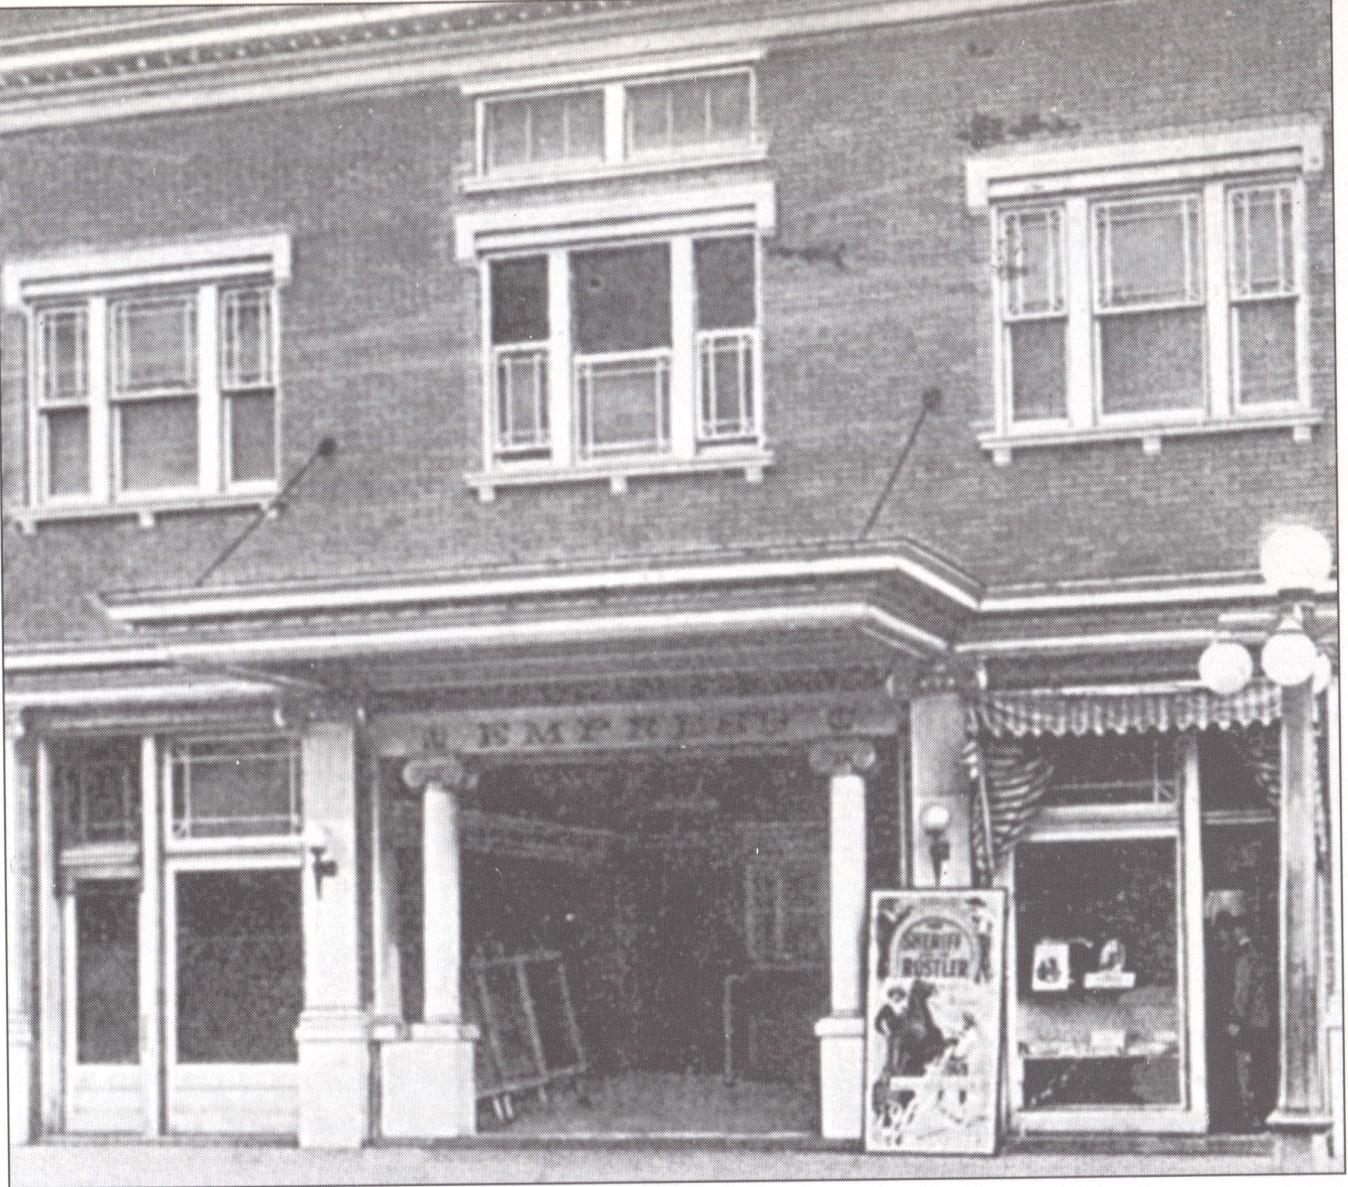 Empress Theatre, date unknown